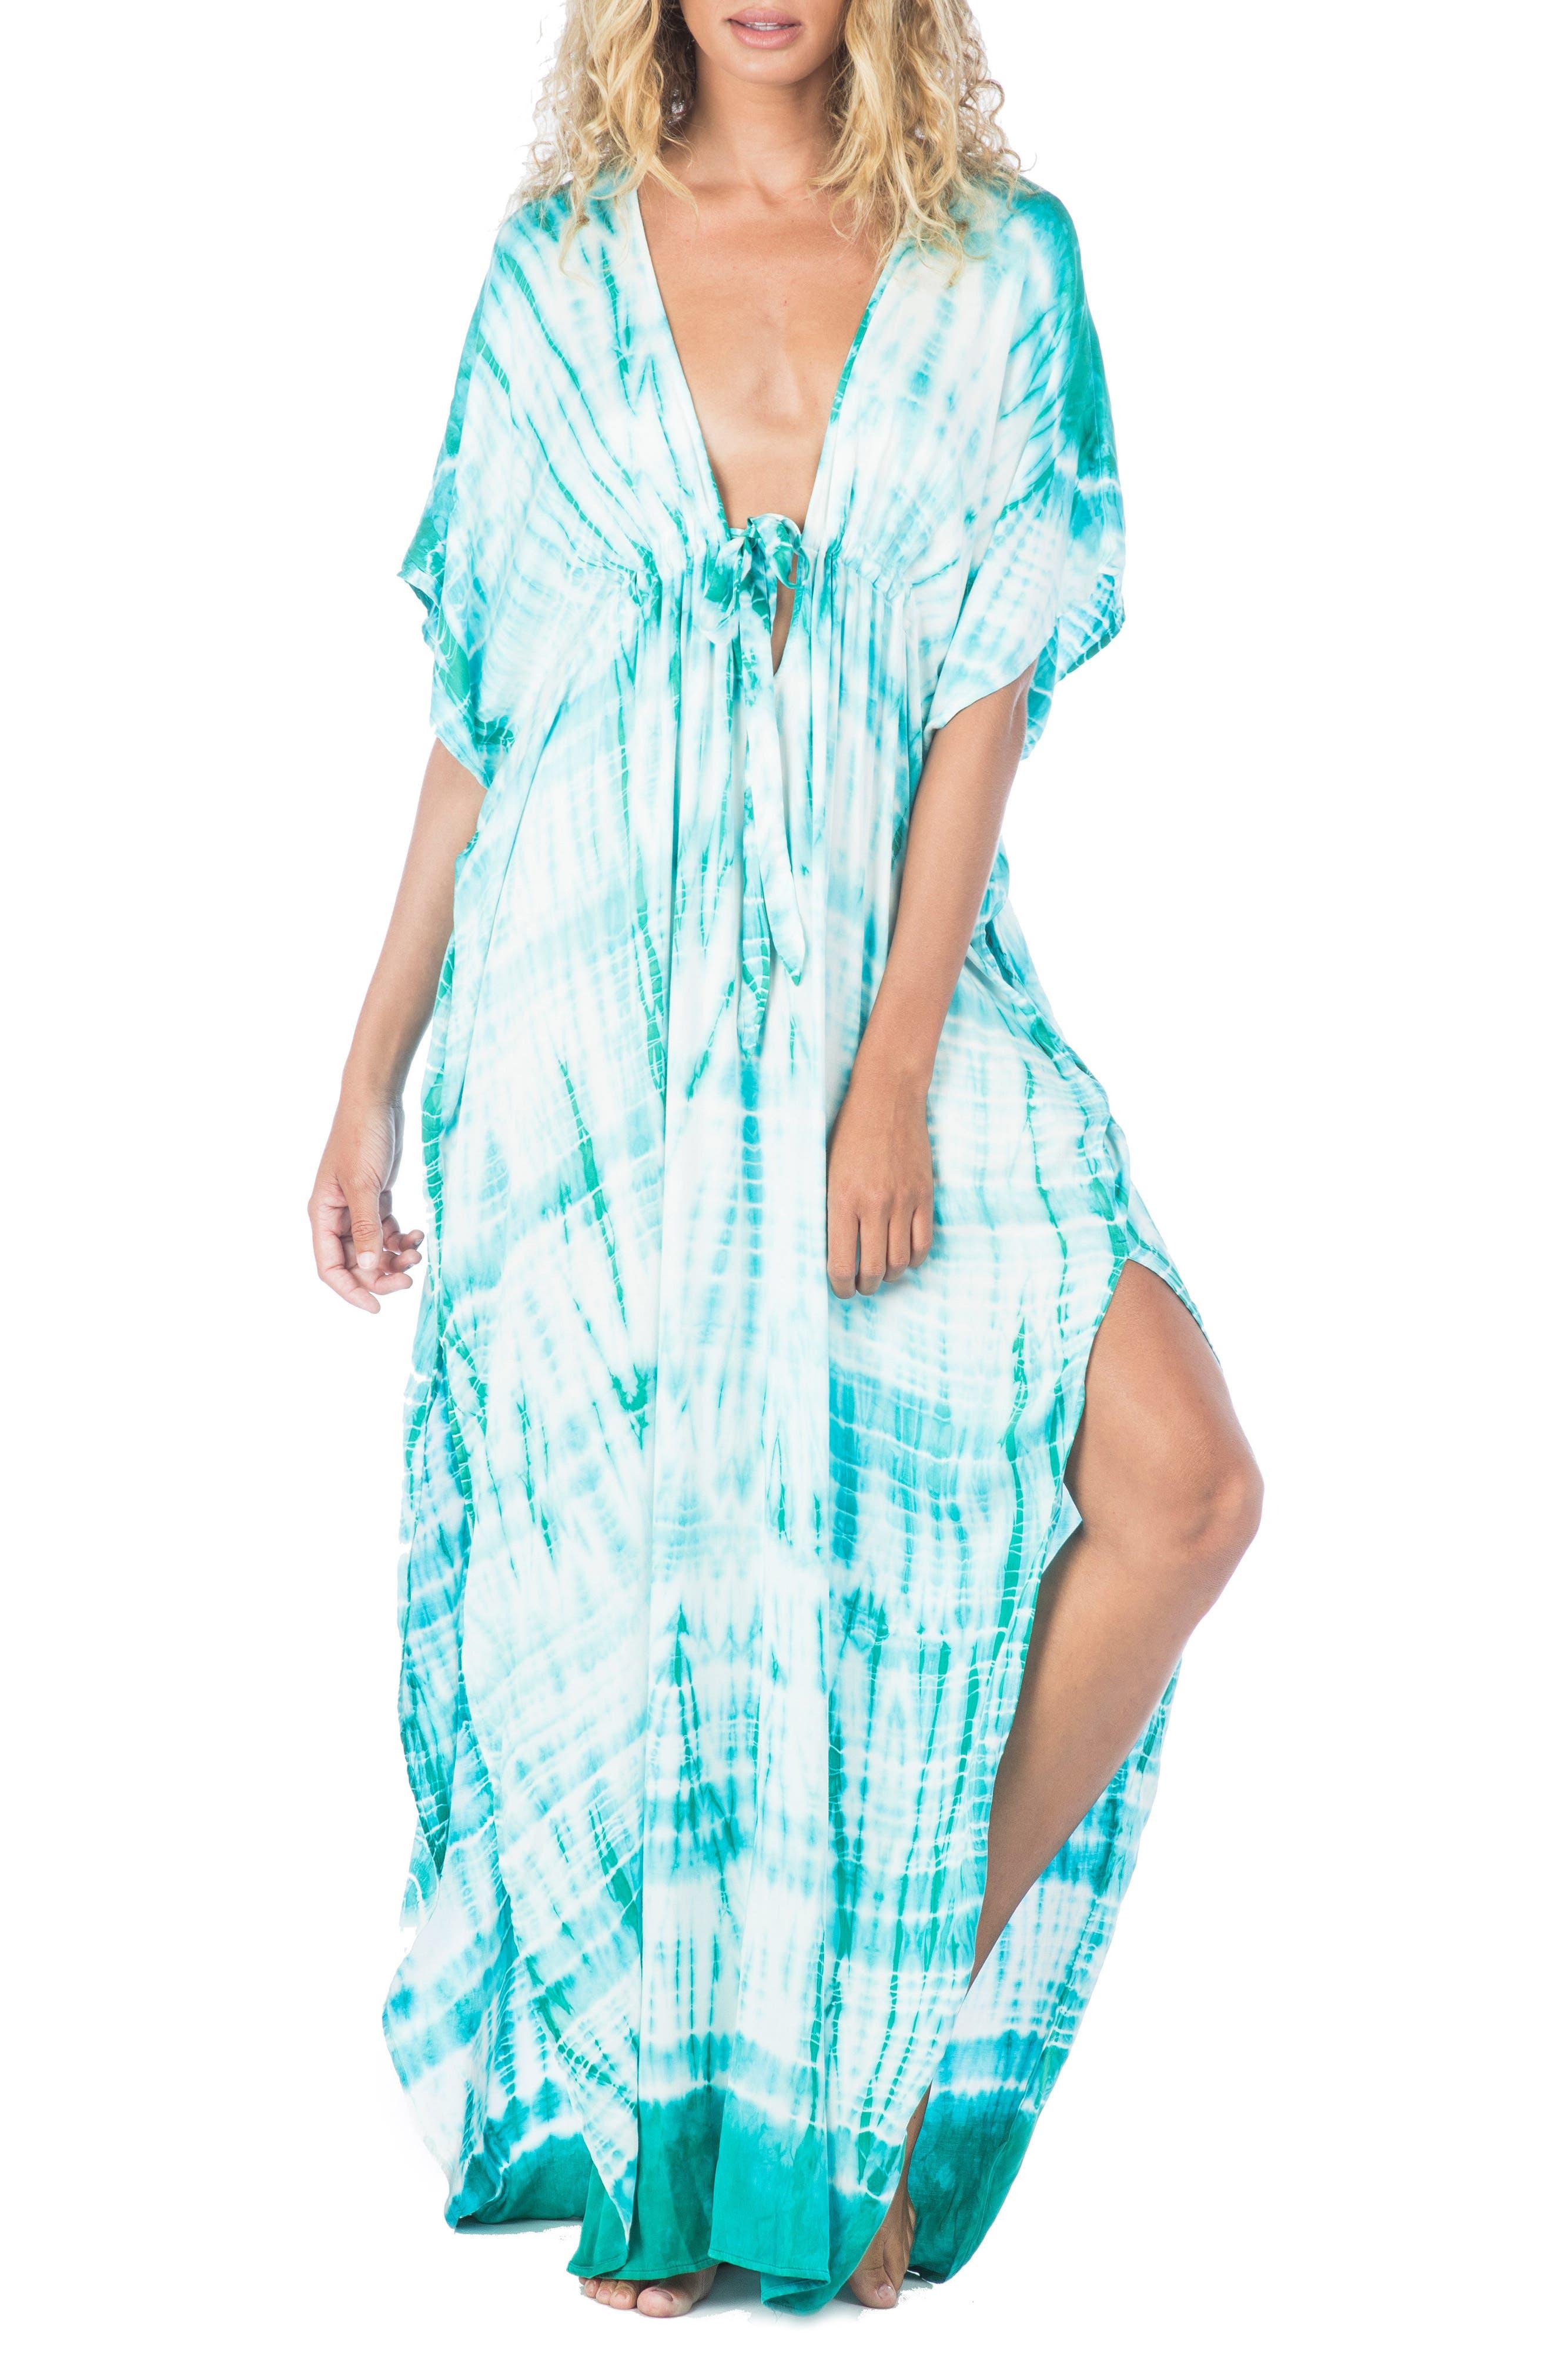 South Beach Tie Dye Ashley Cover-Up Dress,                             Alternate thumbnail 2, color,